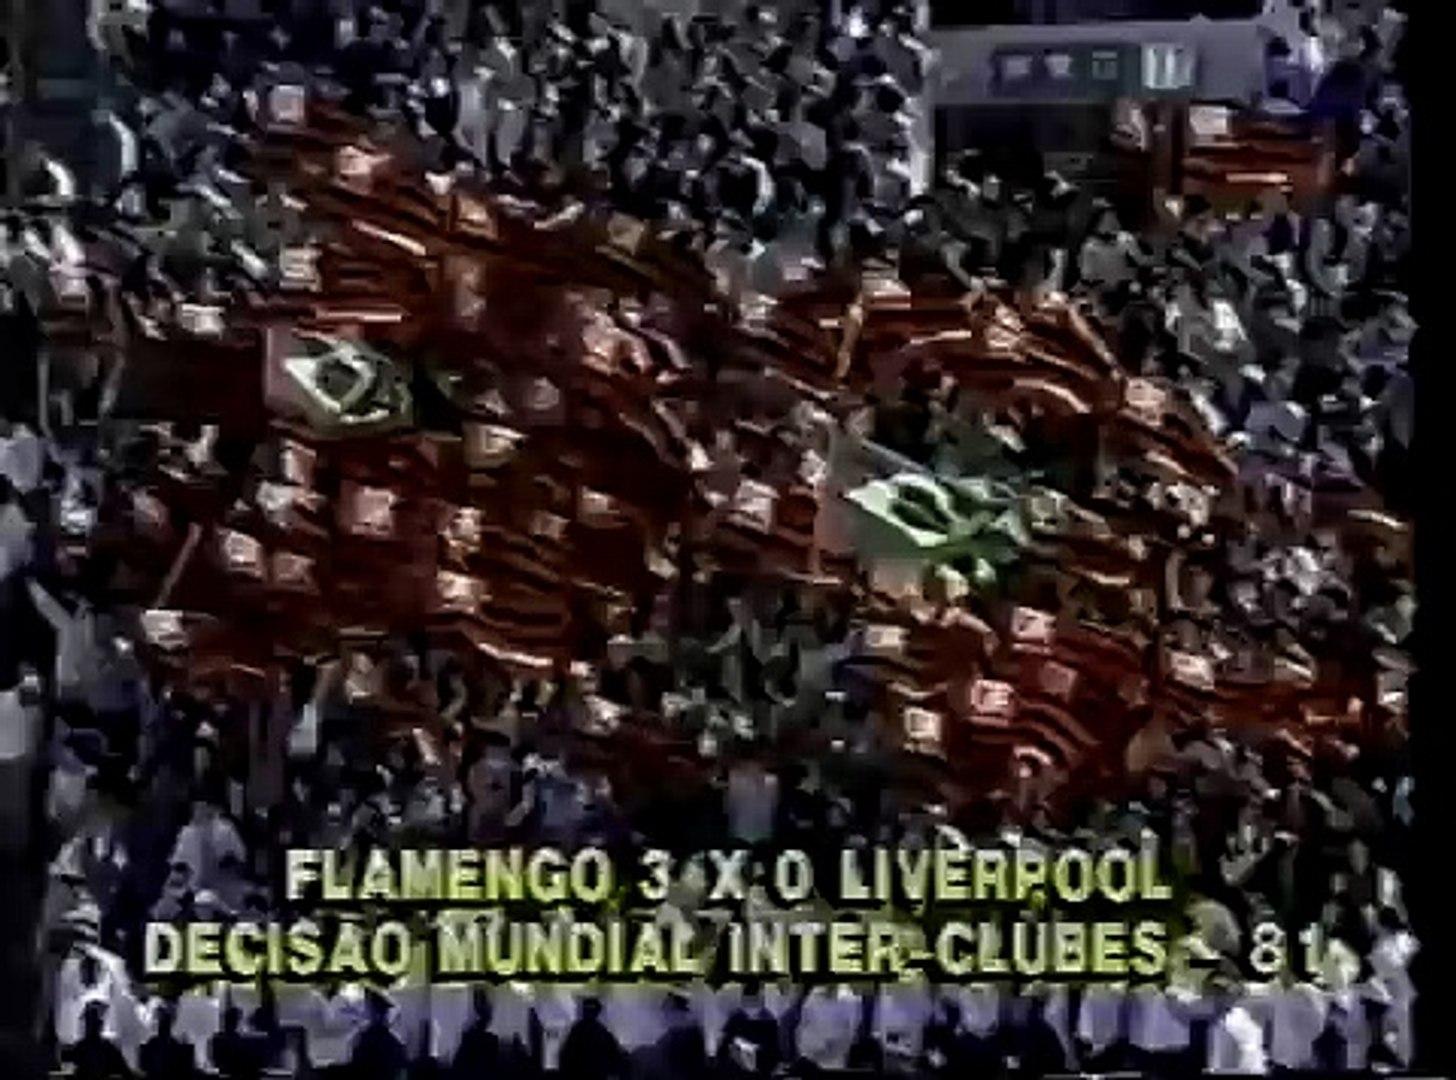 Flamengo - Campeão Mundial Interclubes